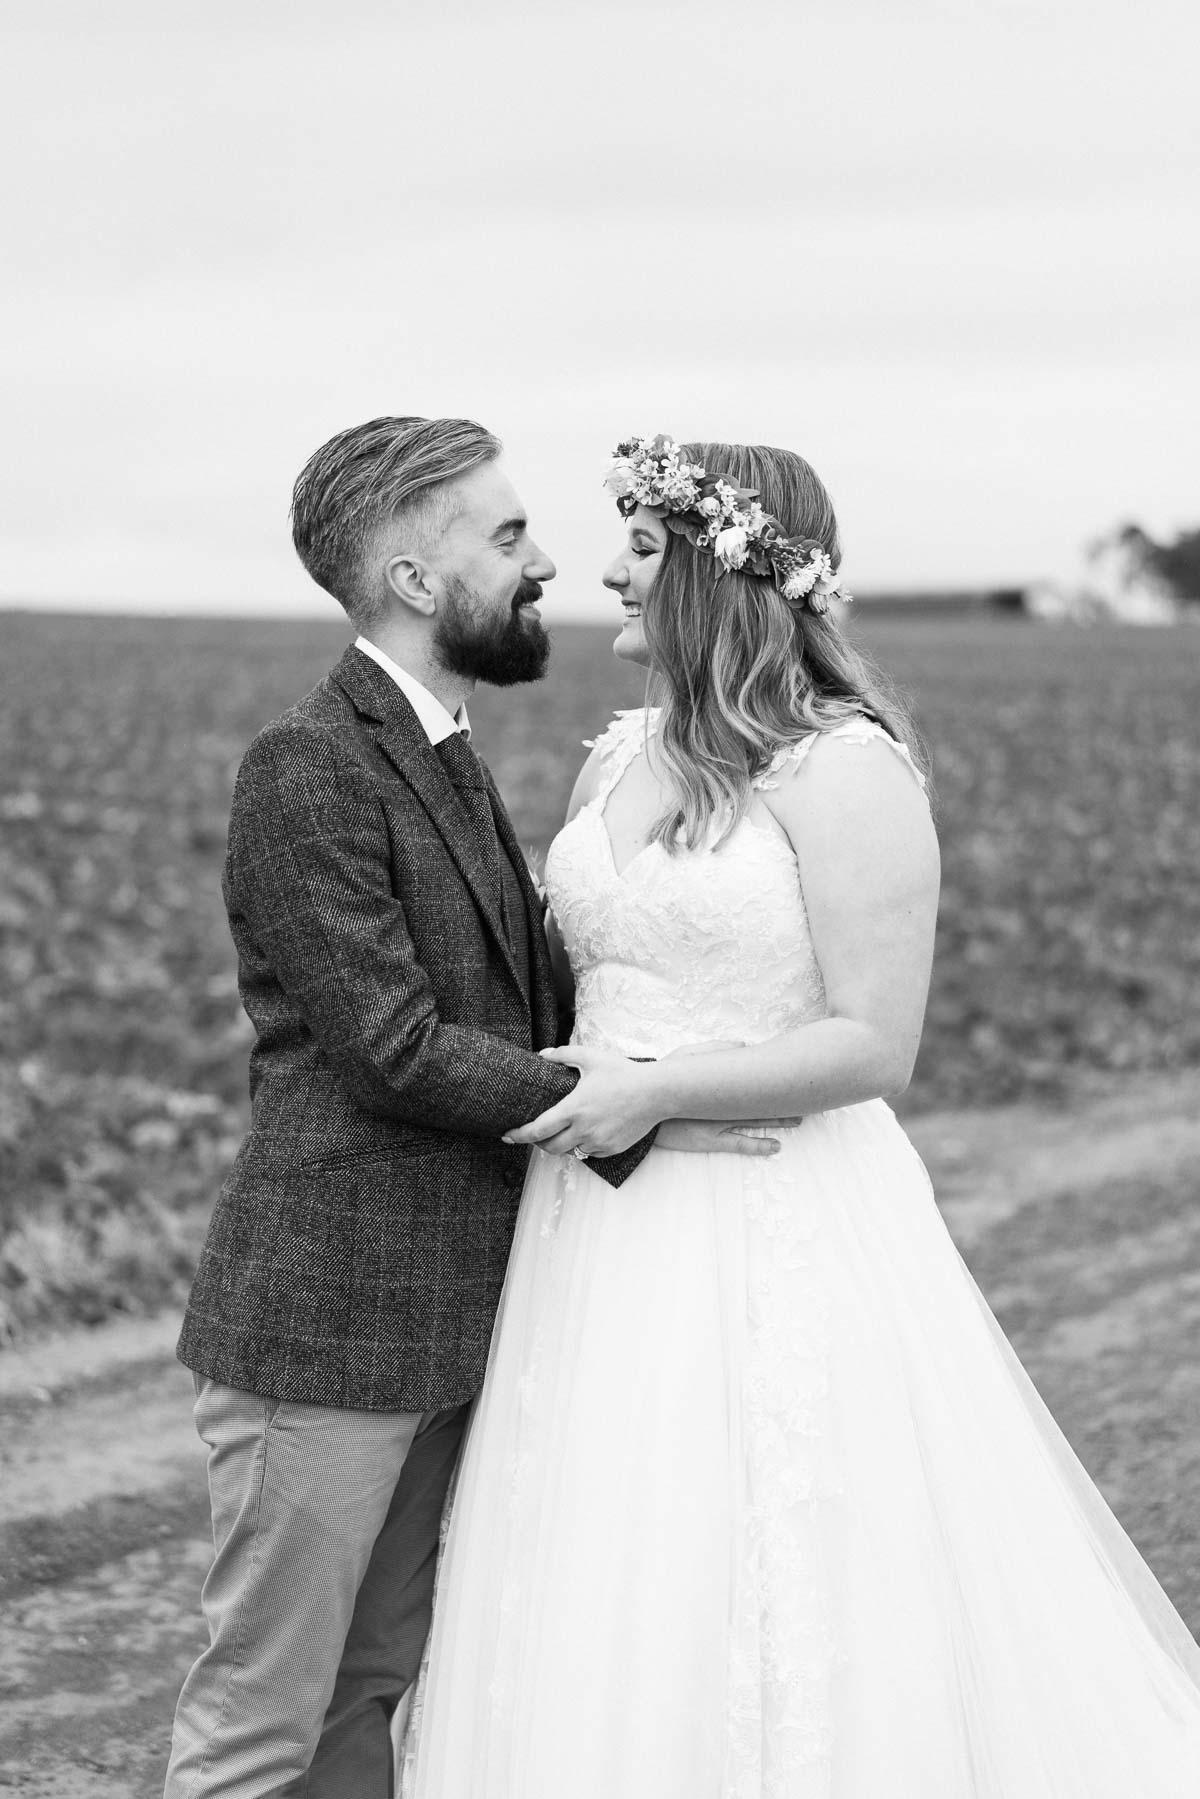 adams-farm-coldstream-yarra-valley-wedding-heart+soul-weddings-kel-jarryd-05543.jpg